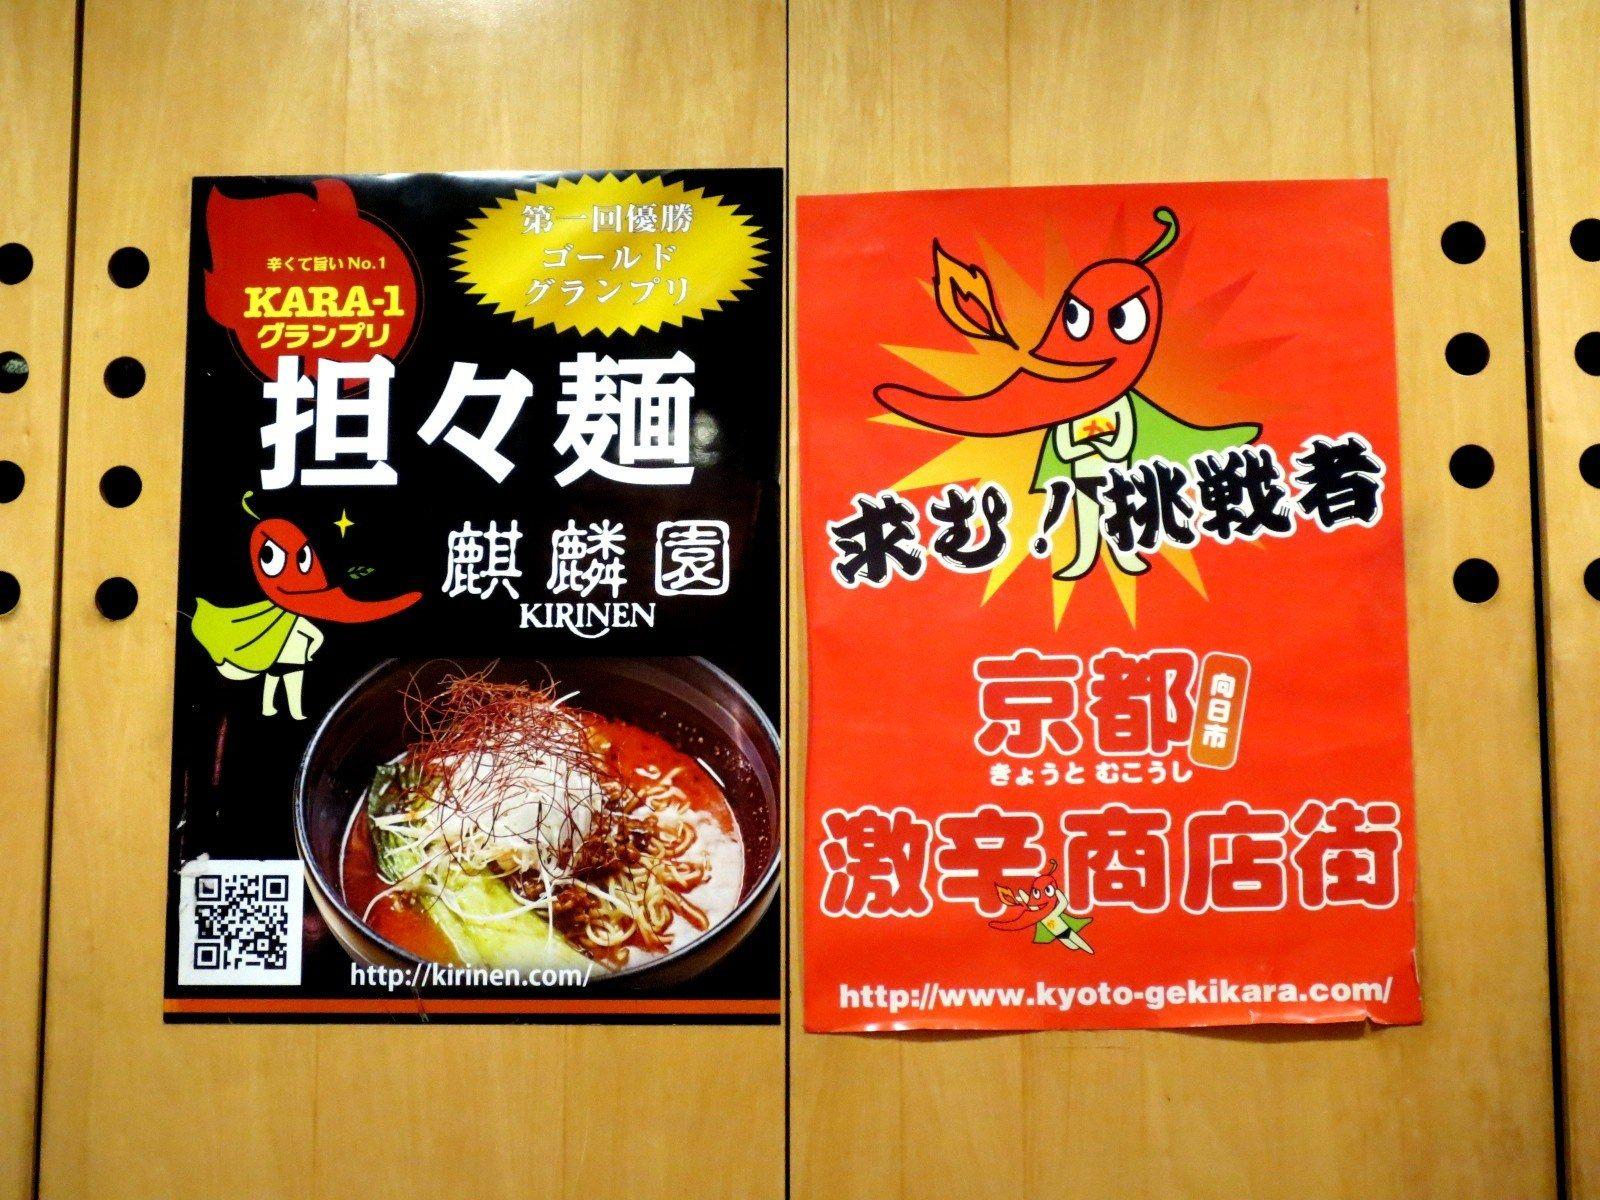 Menu of (Authentic) Chinese Food, Kirinen